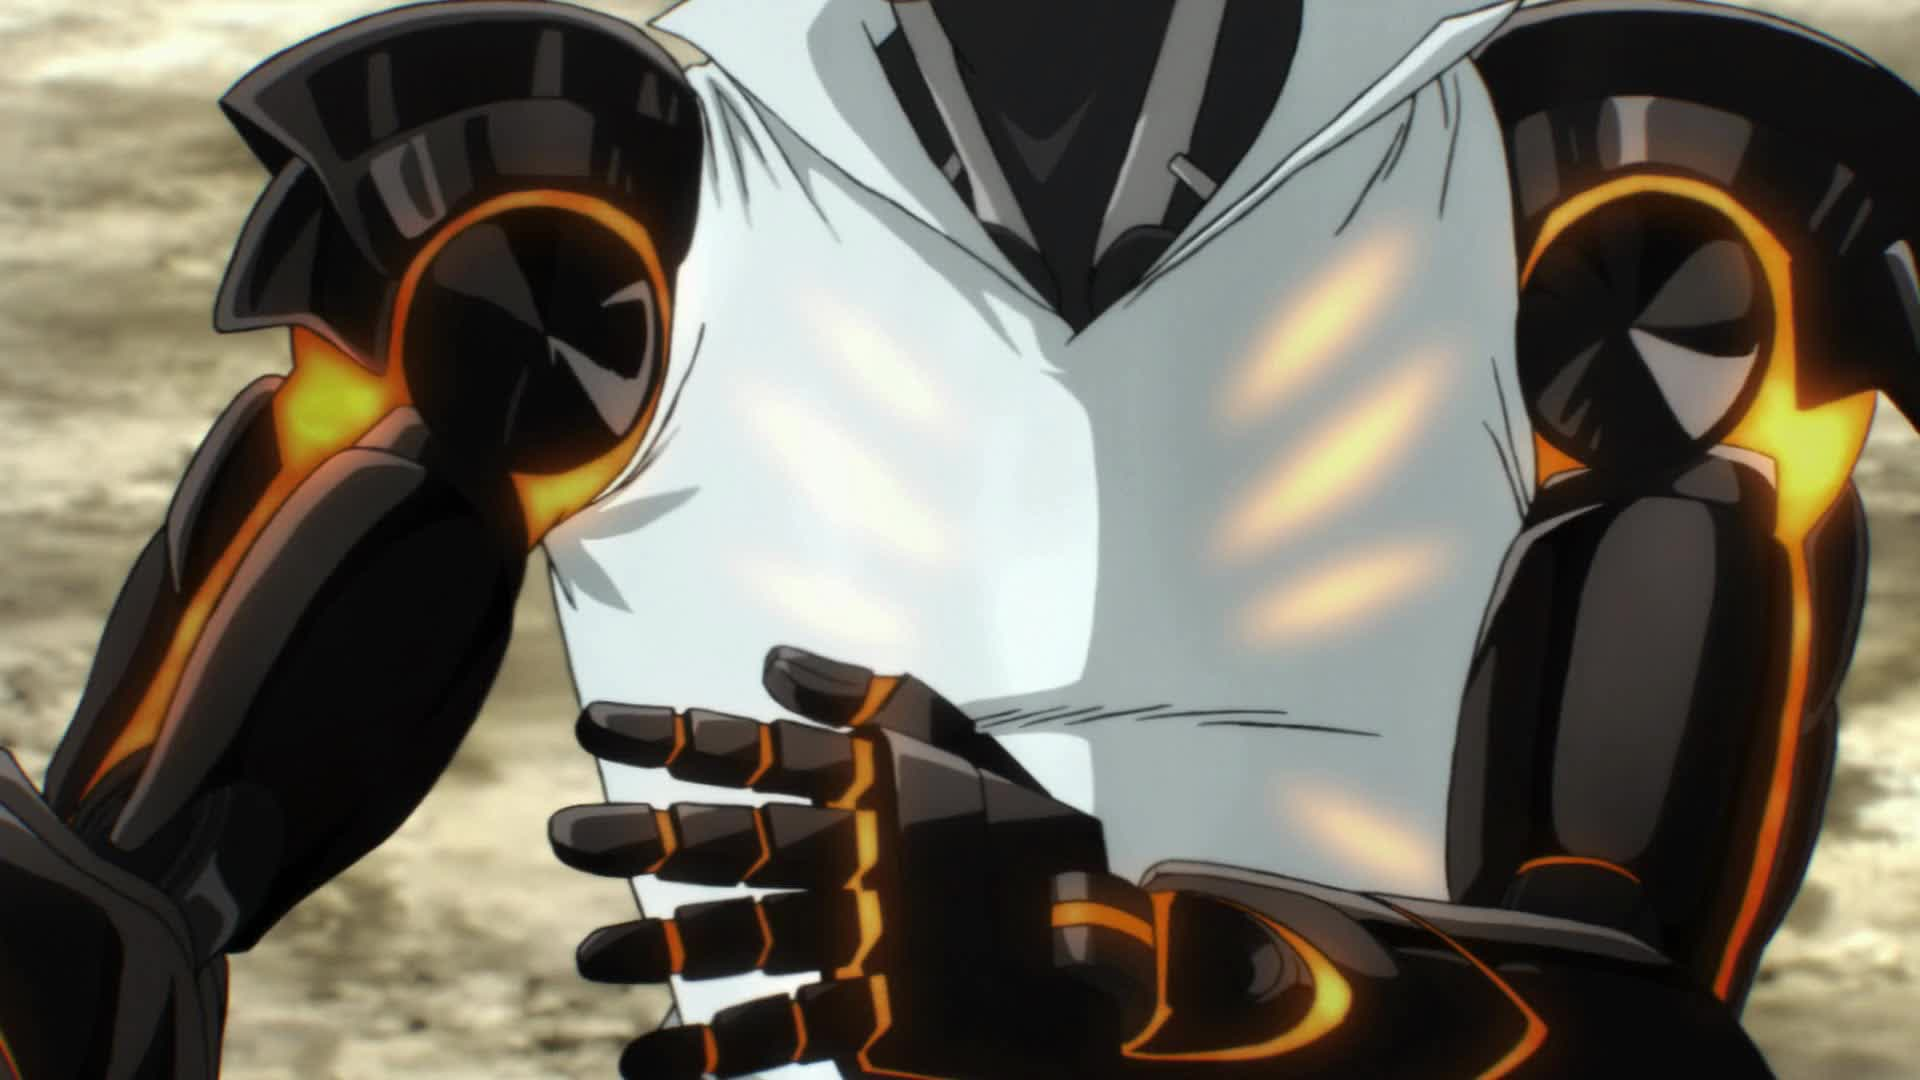 Genos Anti-Saitama Tactical Gear GIFs